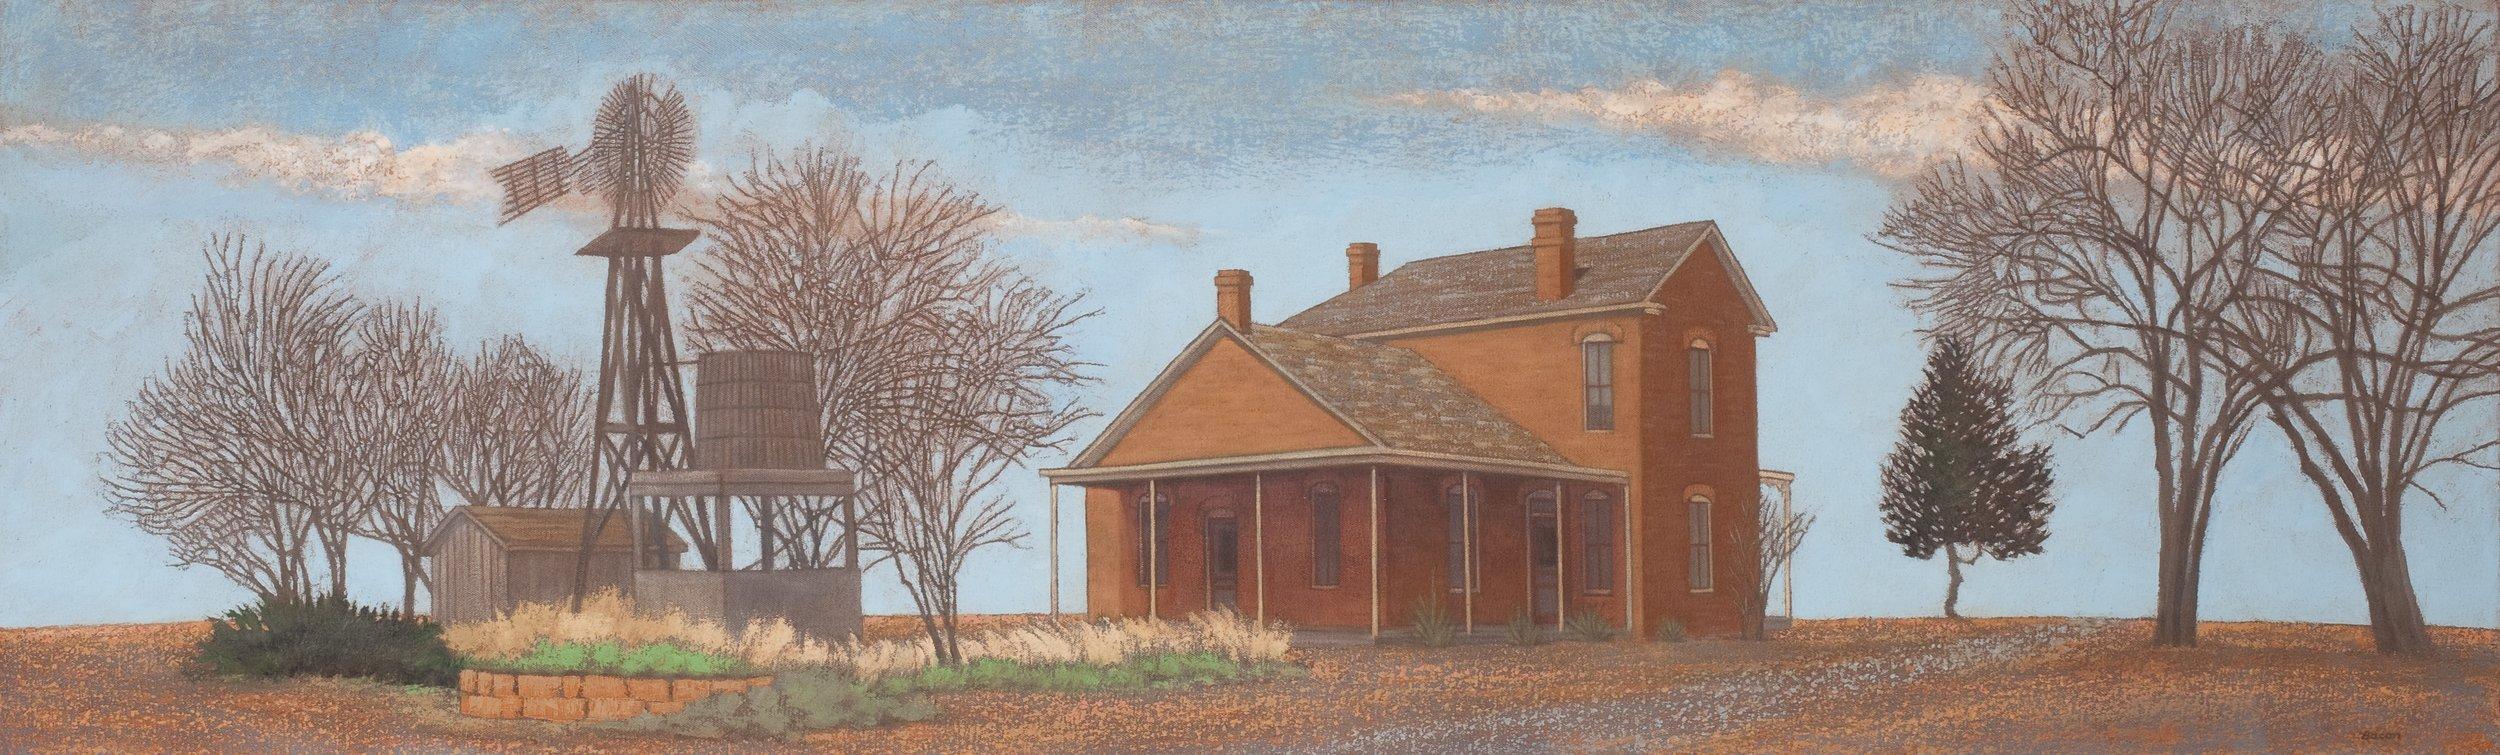 Randy Bacon, The Oldest House, 2013